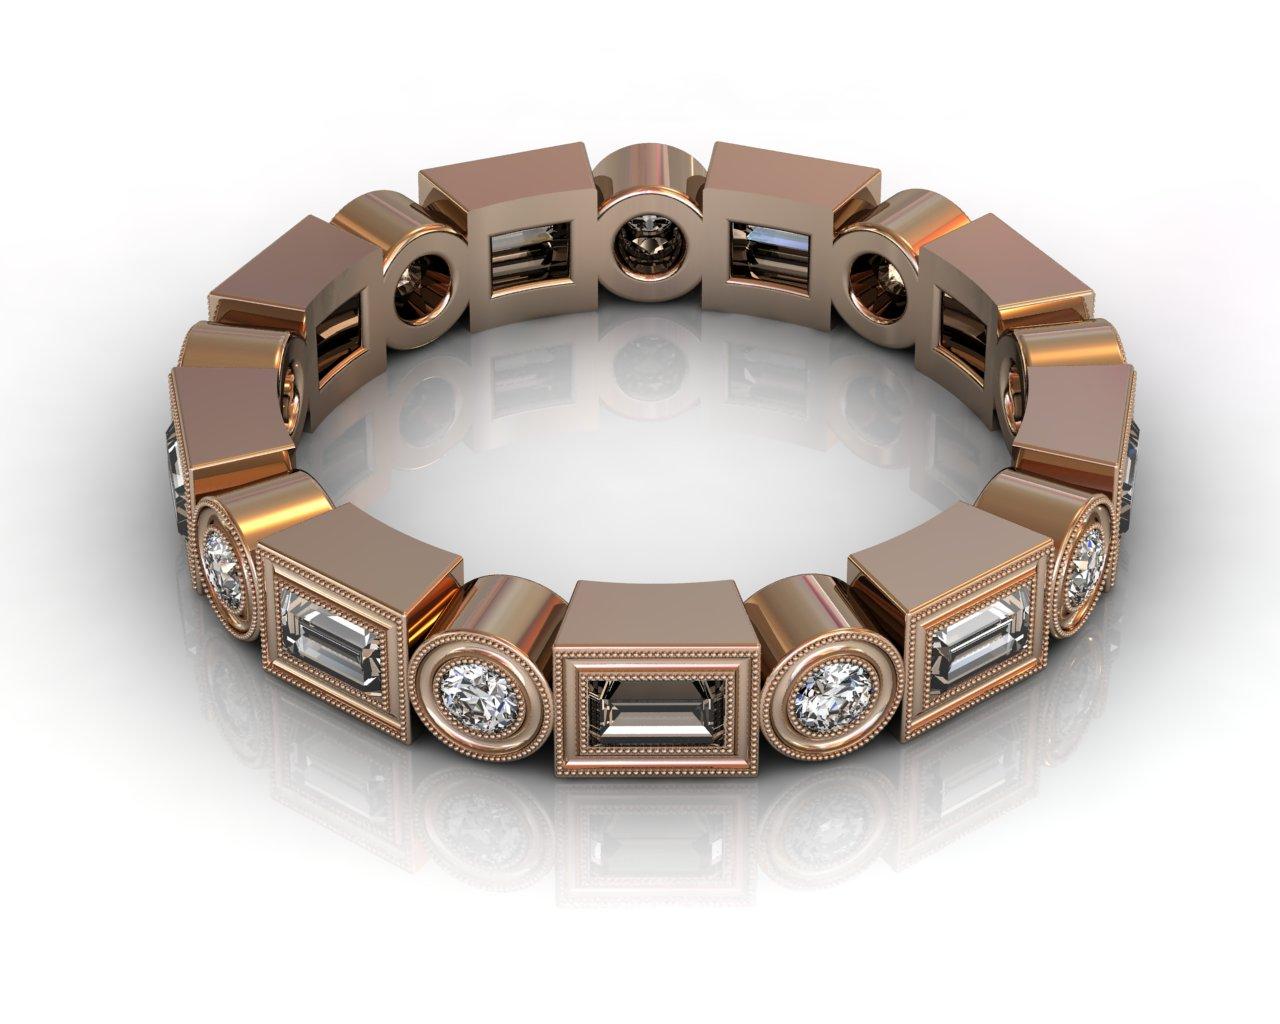 Wedding Bands Ladies South Bay Gold Diamonds Bezel 18 Stone 0.77 TCW Diamonds 5.16g 18kt Rose Gold